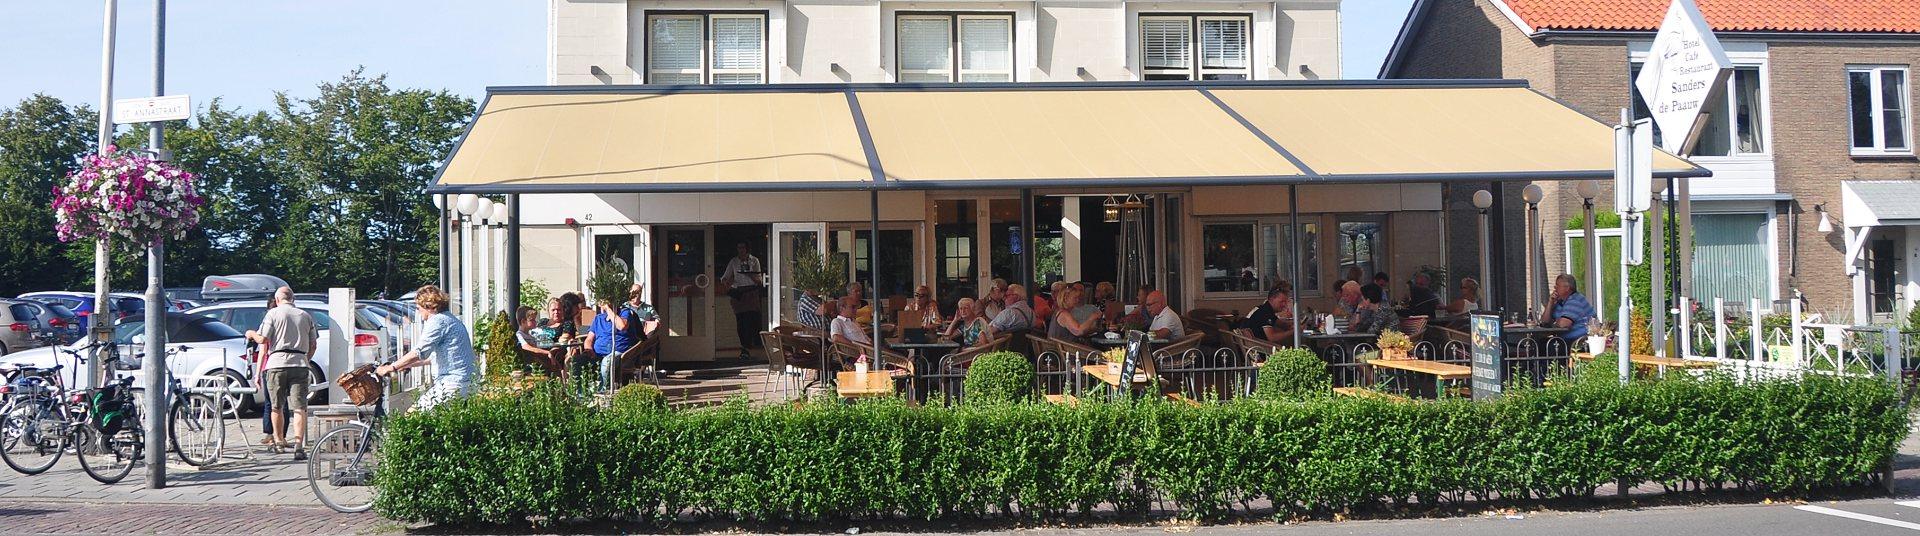 sluis-hotel-restaurant-sdp